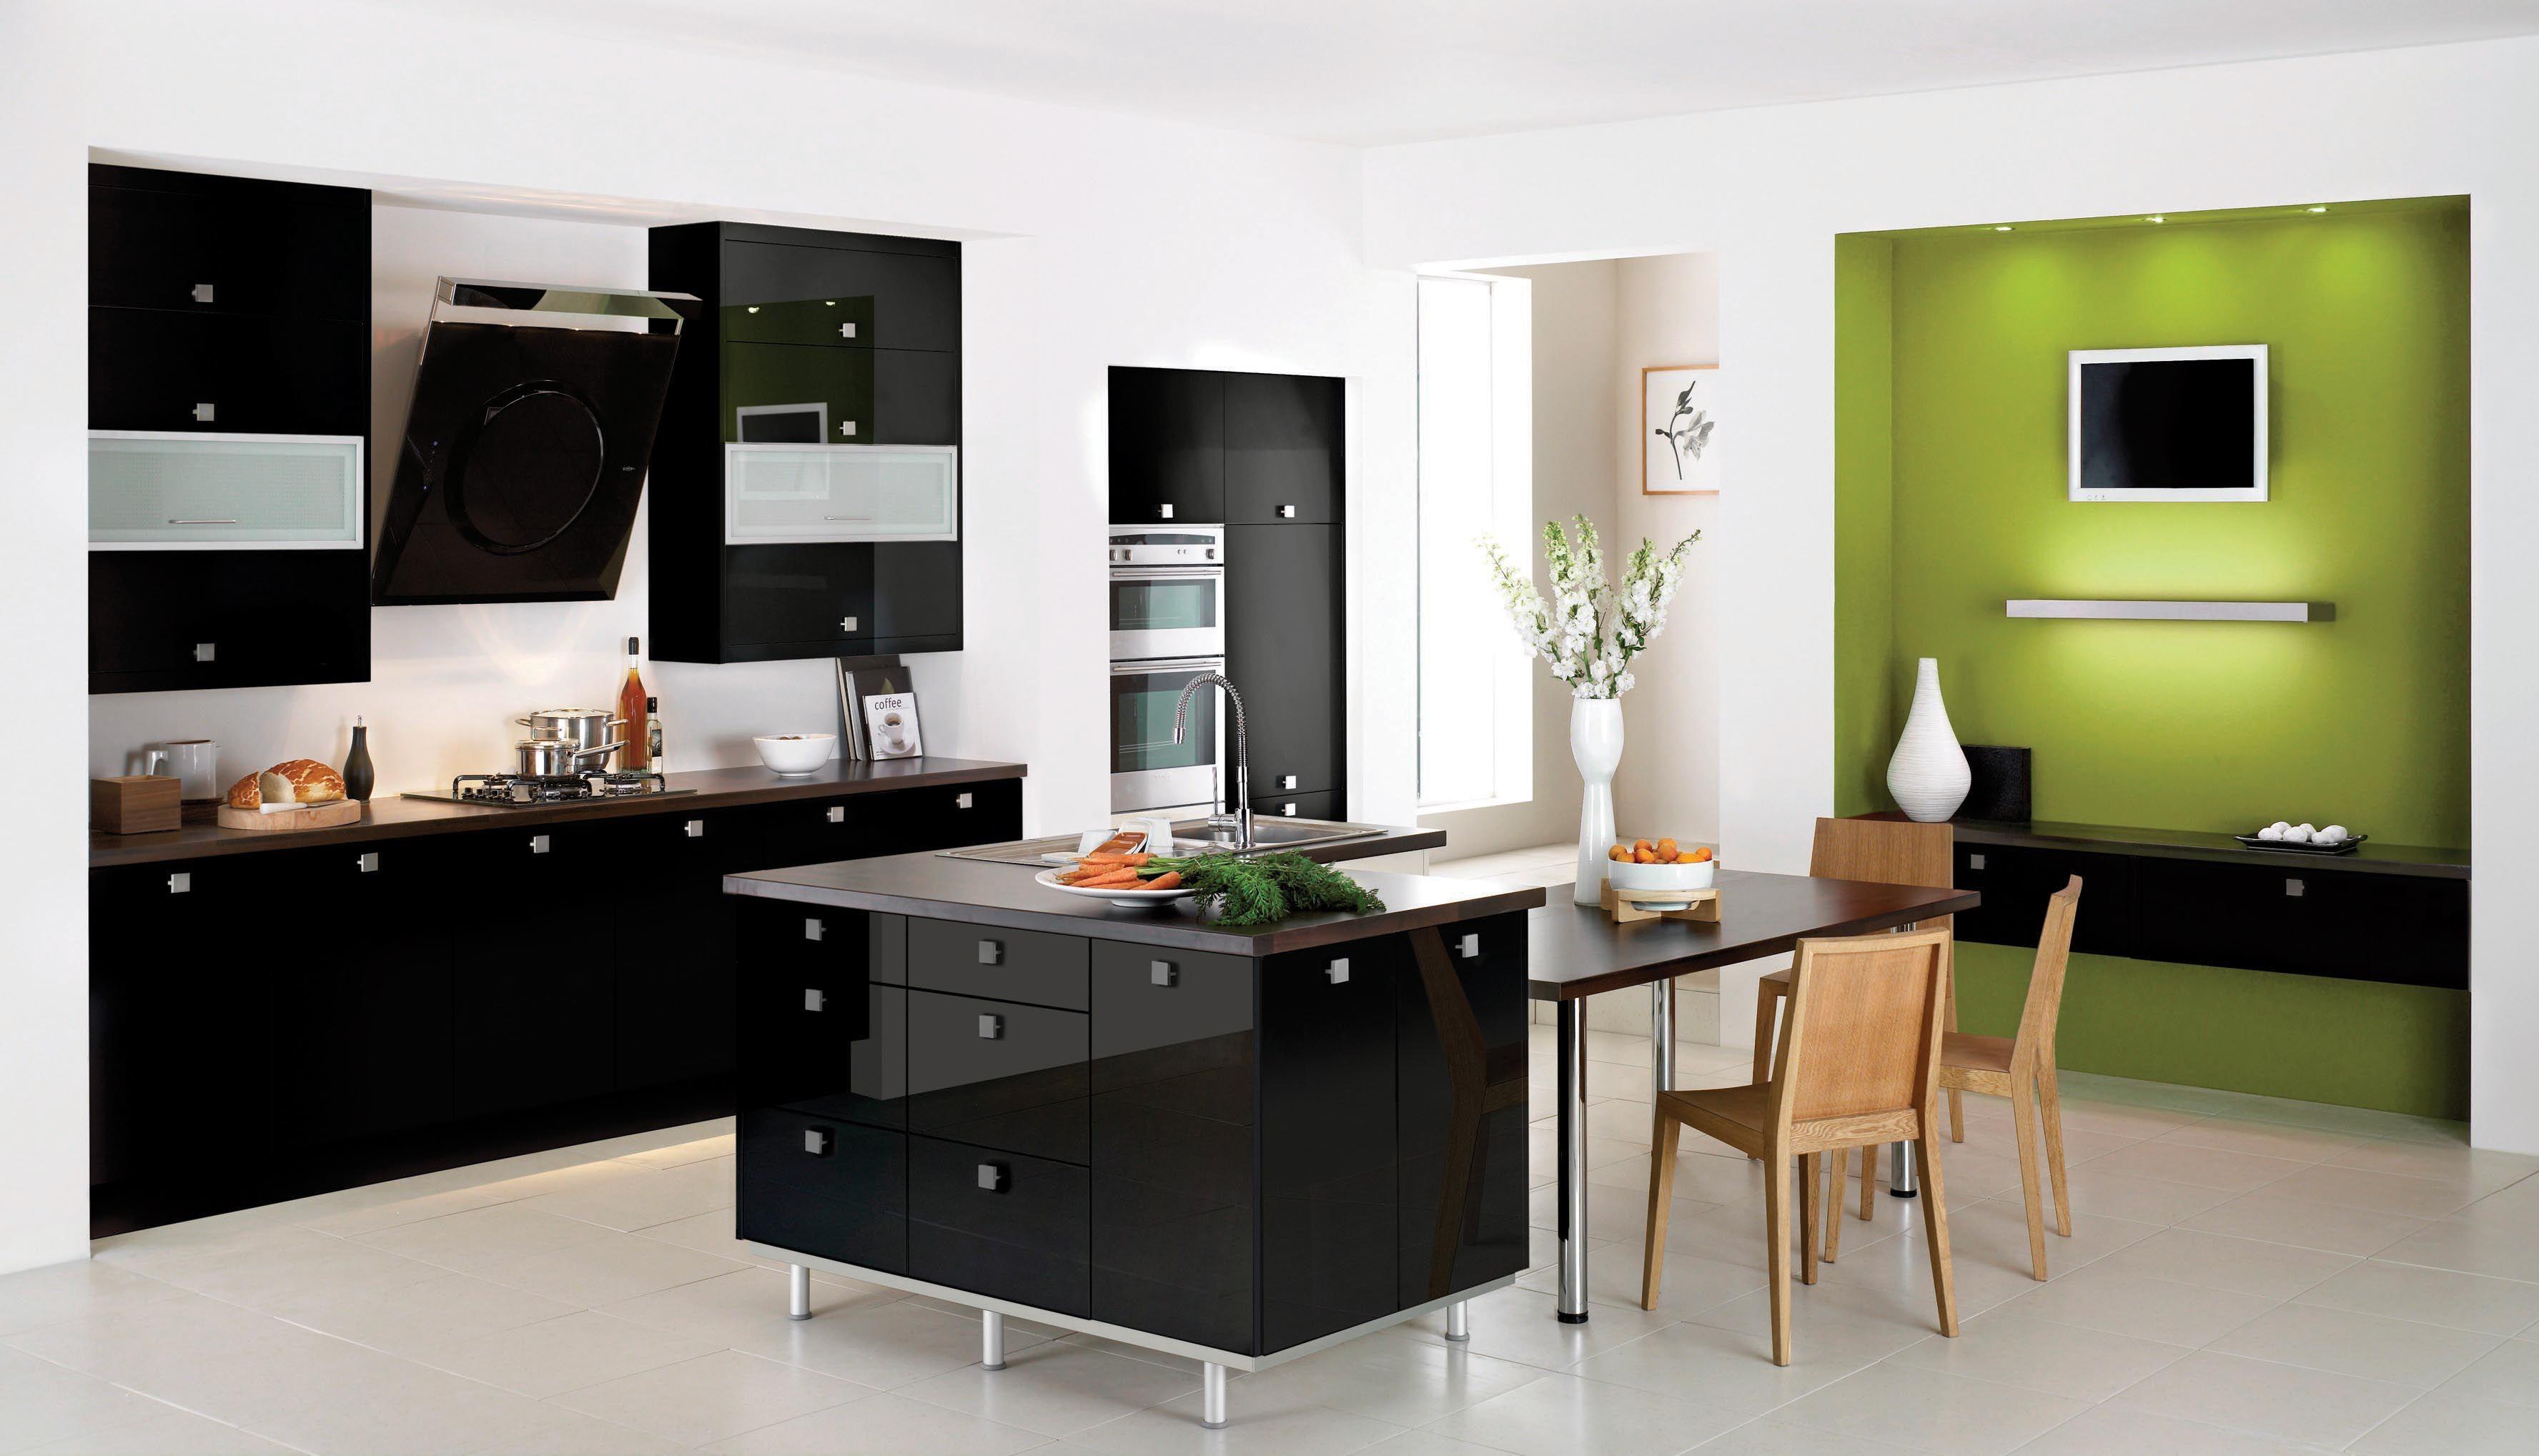 kitchen remodels Contemporary Kitchen Design Pictures Photos